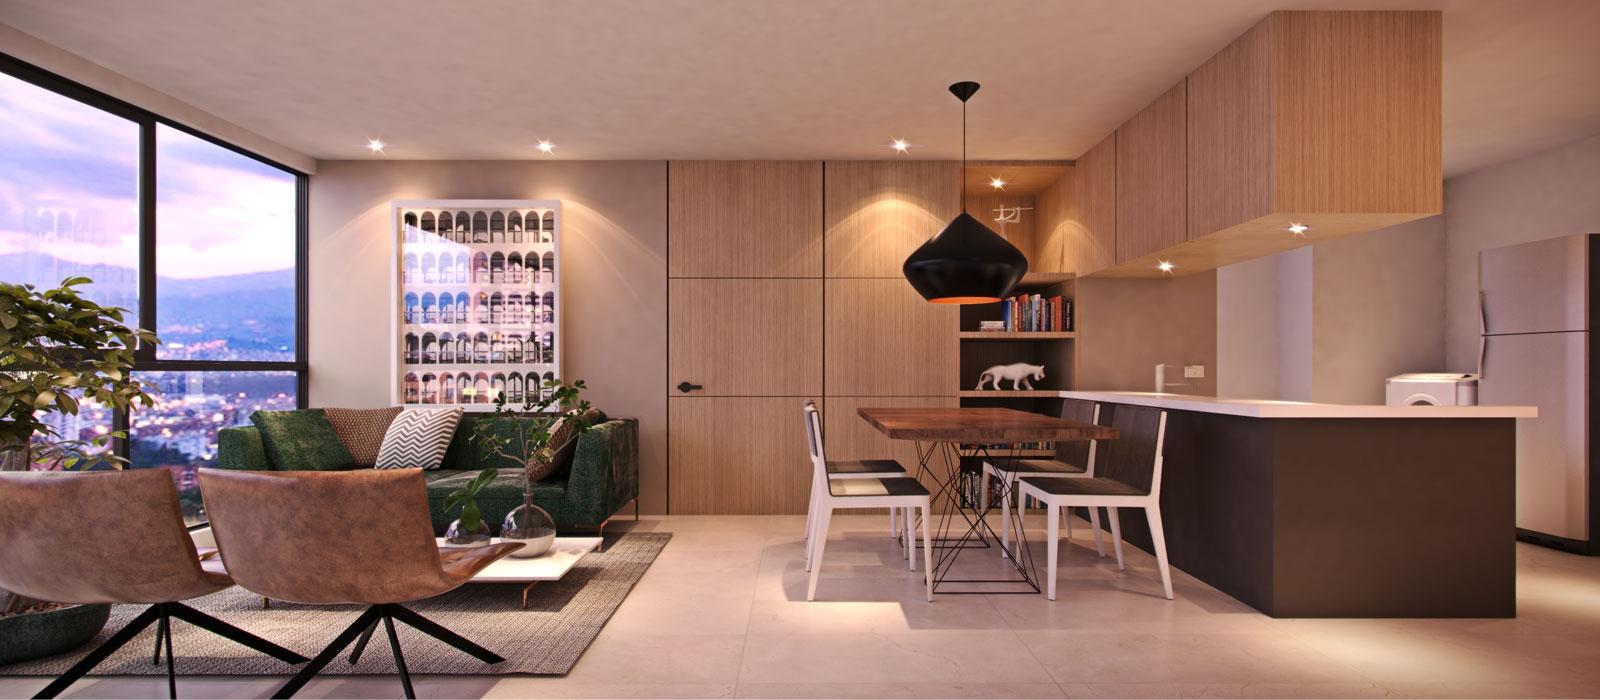 Fiorenza-Apartamentos